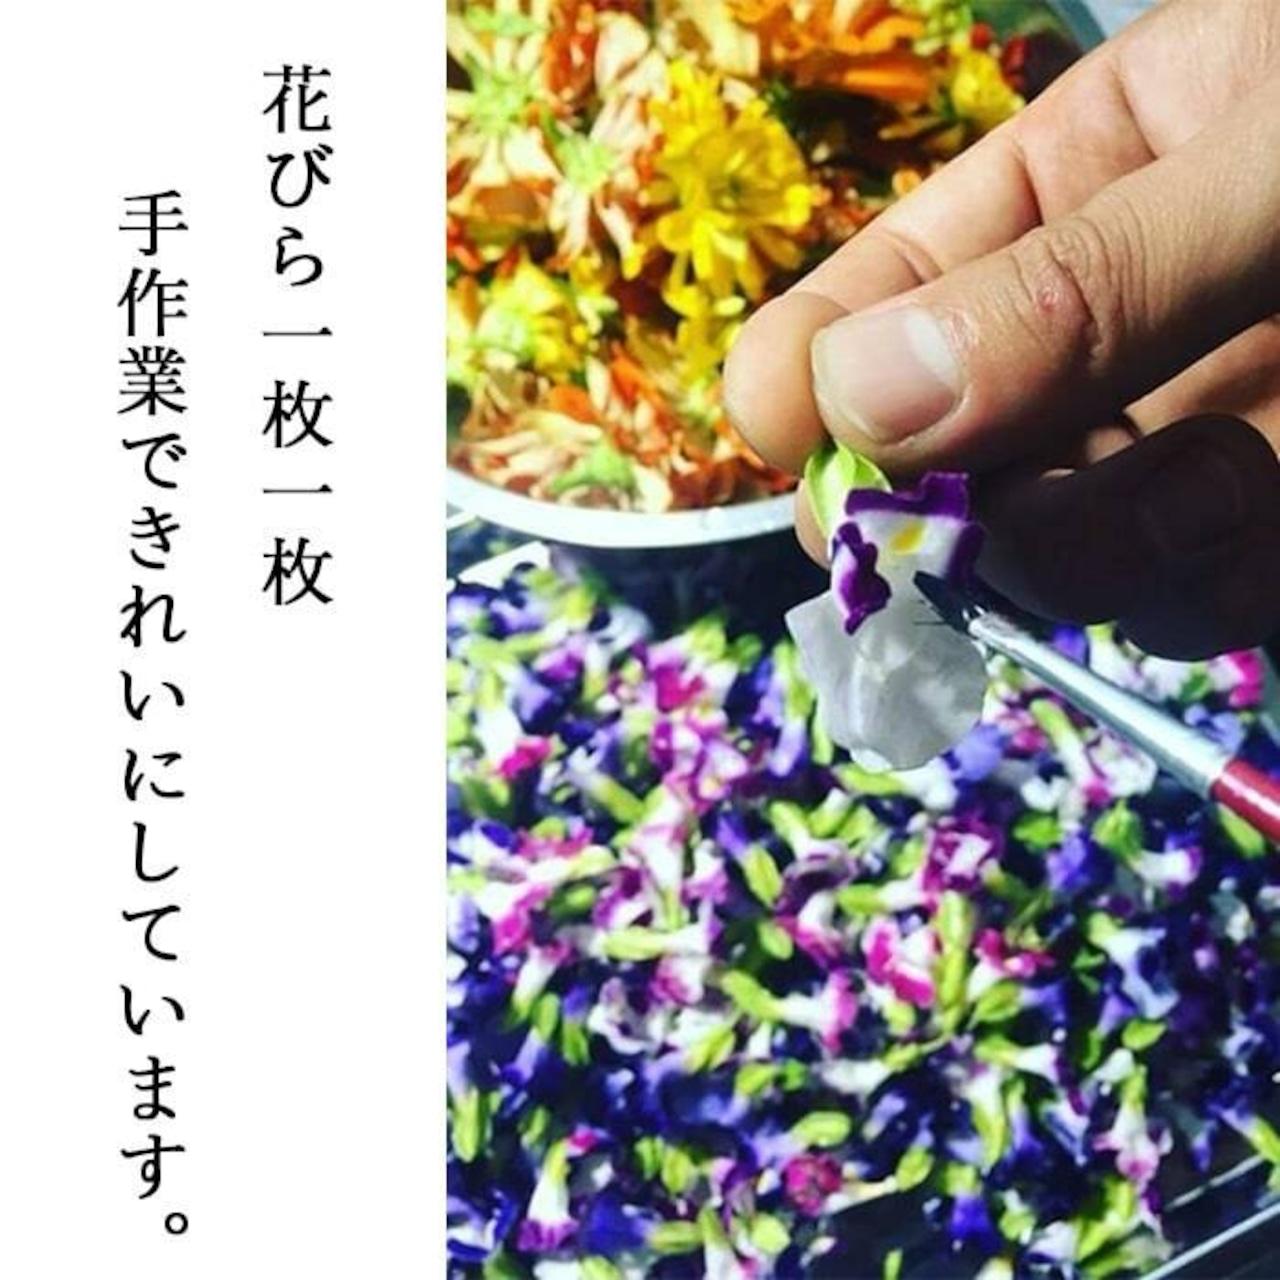 【87farm】業務用 食べられる ドライフラワー(ビオラ ひぐれももか ) エディブルフラワー